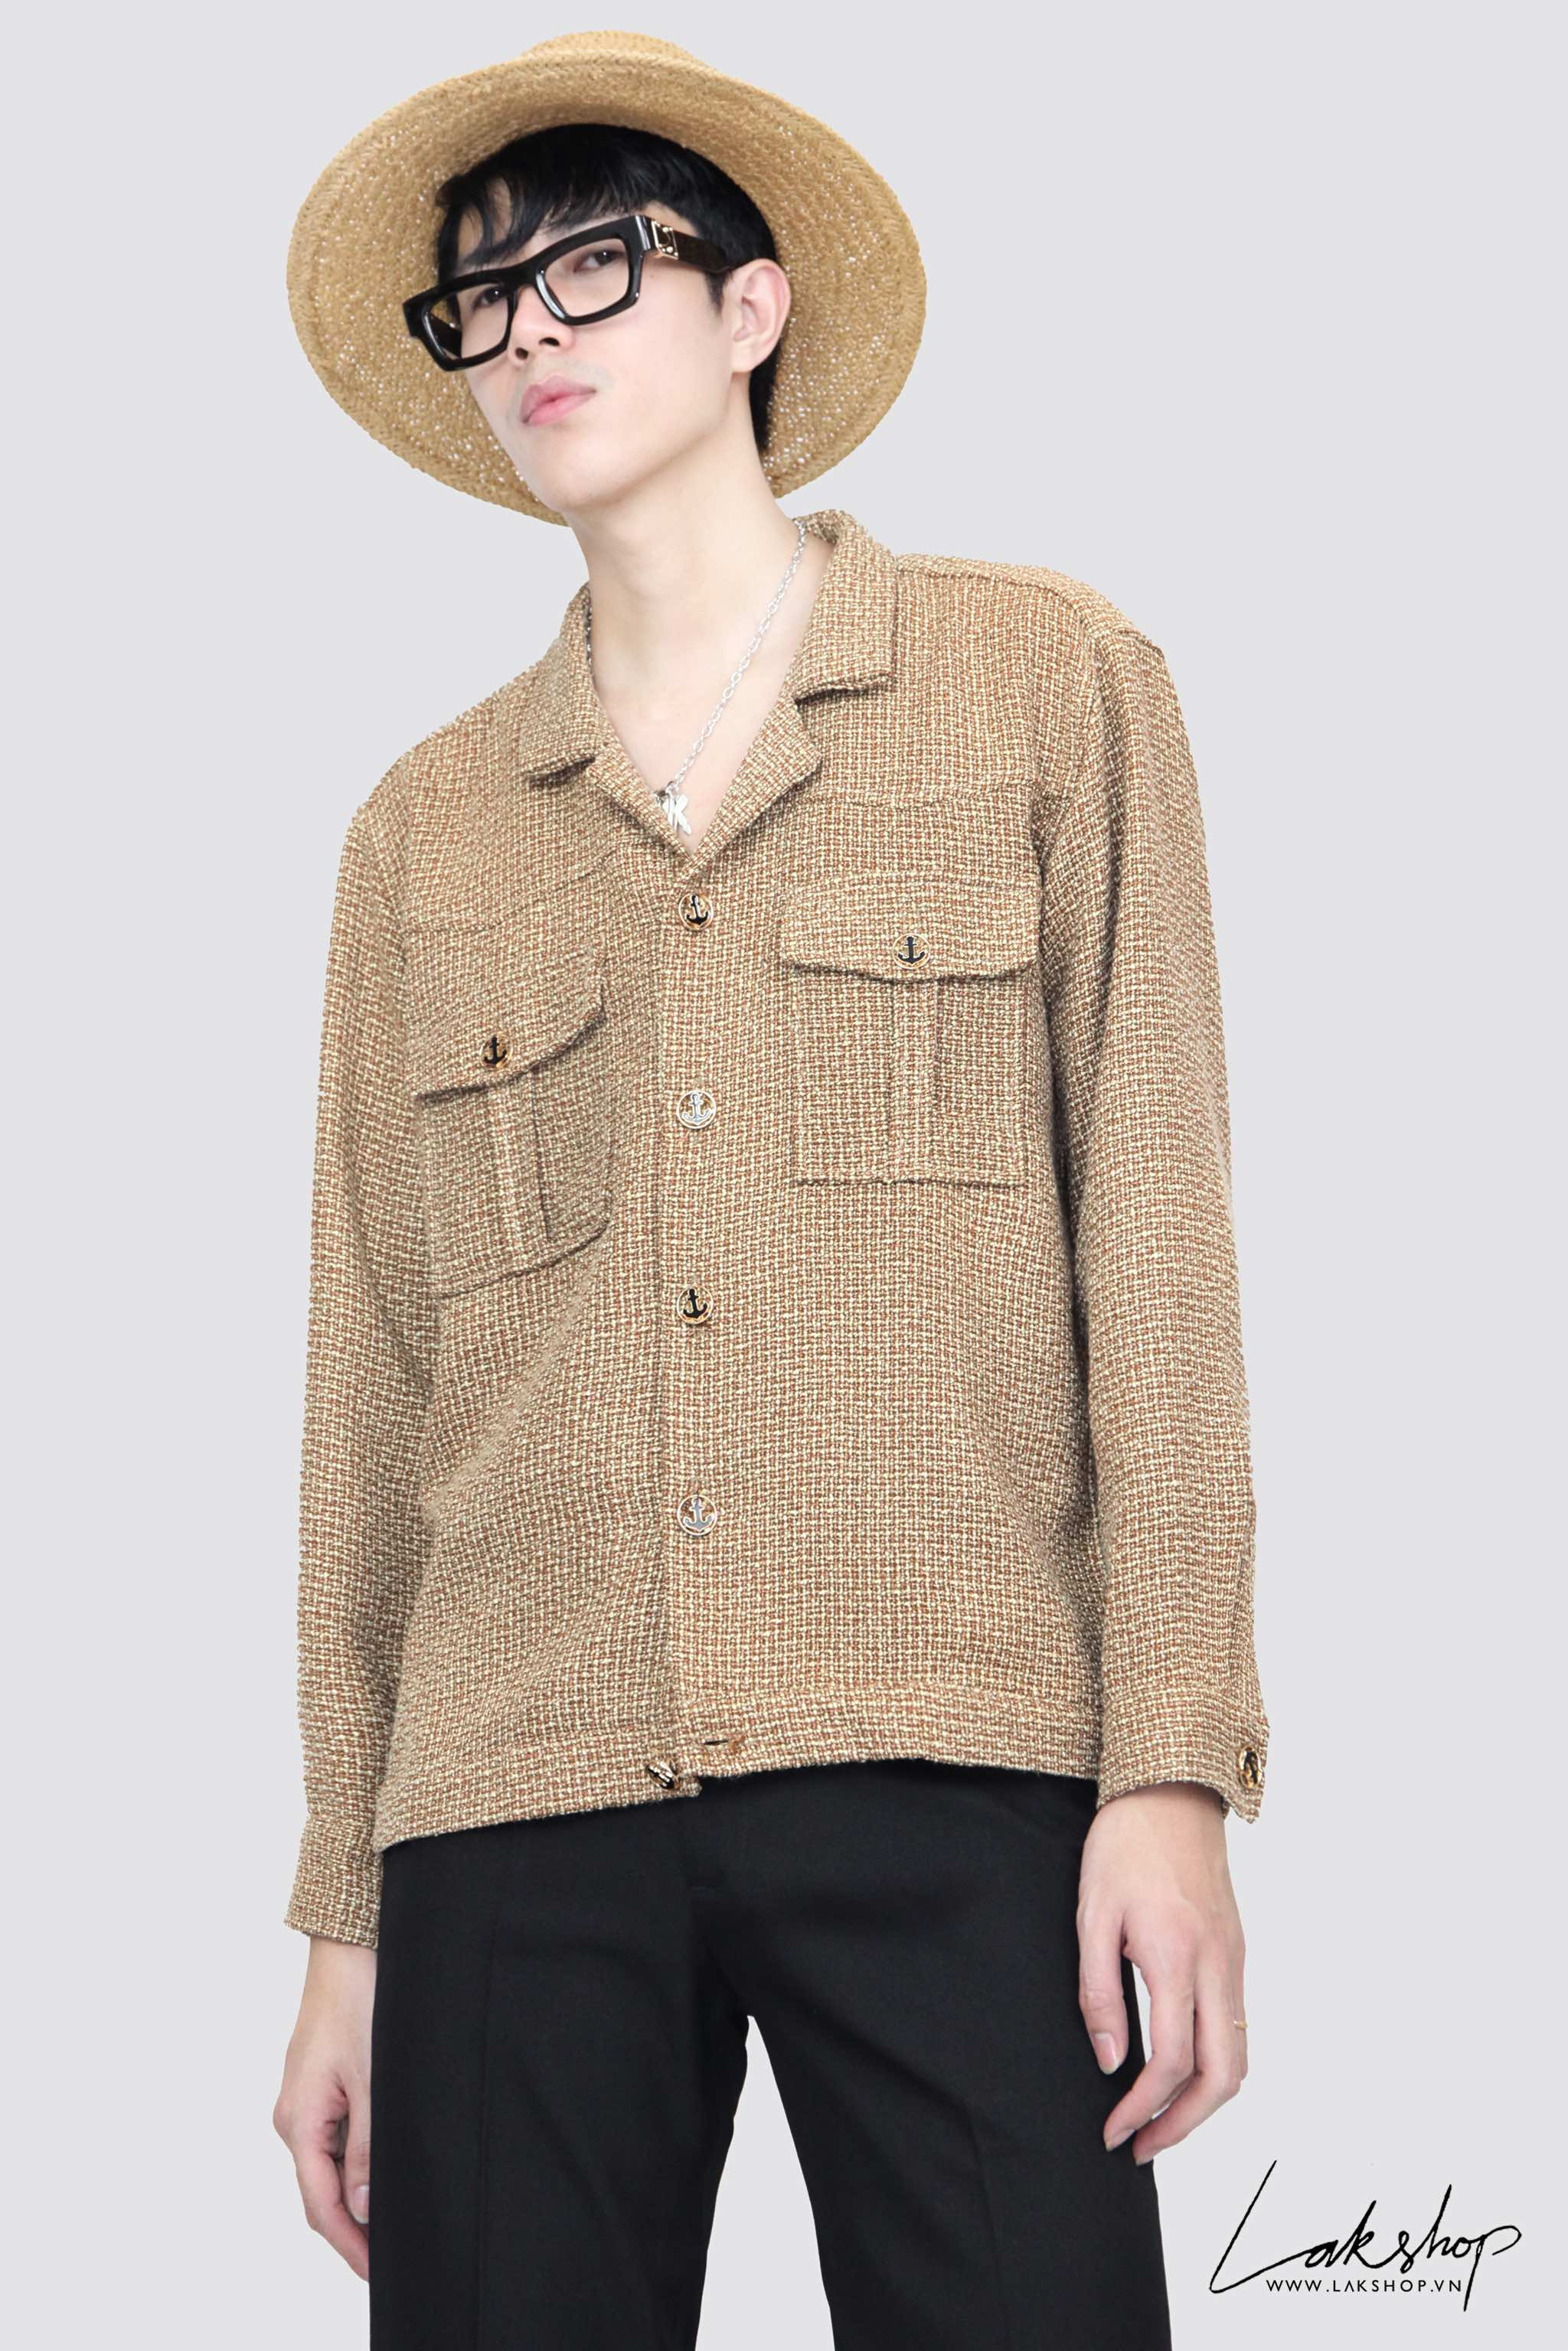 Lak Studios Black With Chain Silk Shirts cv1